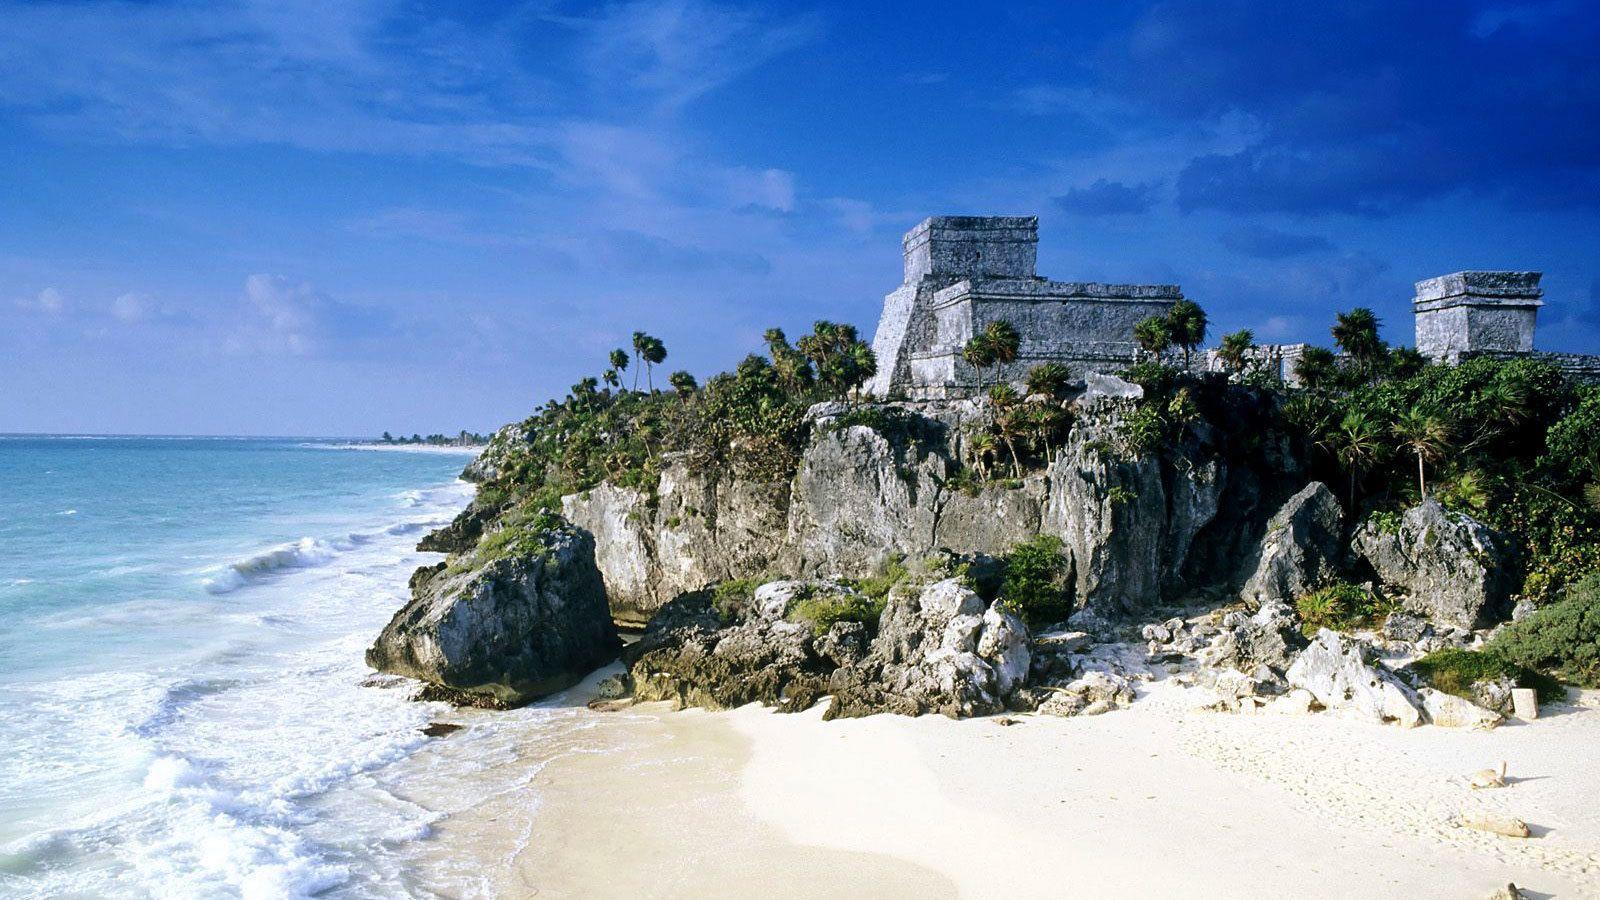 Ruins on the coast of Tulum, Mexico